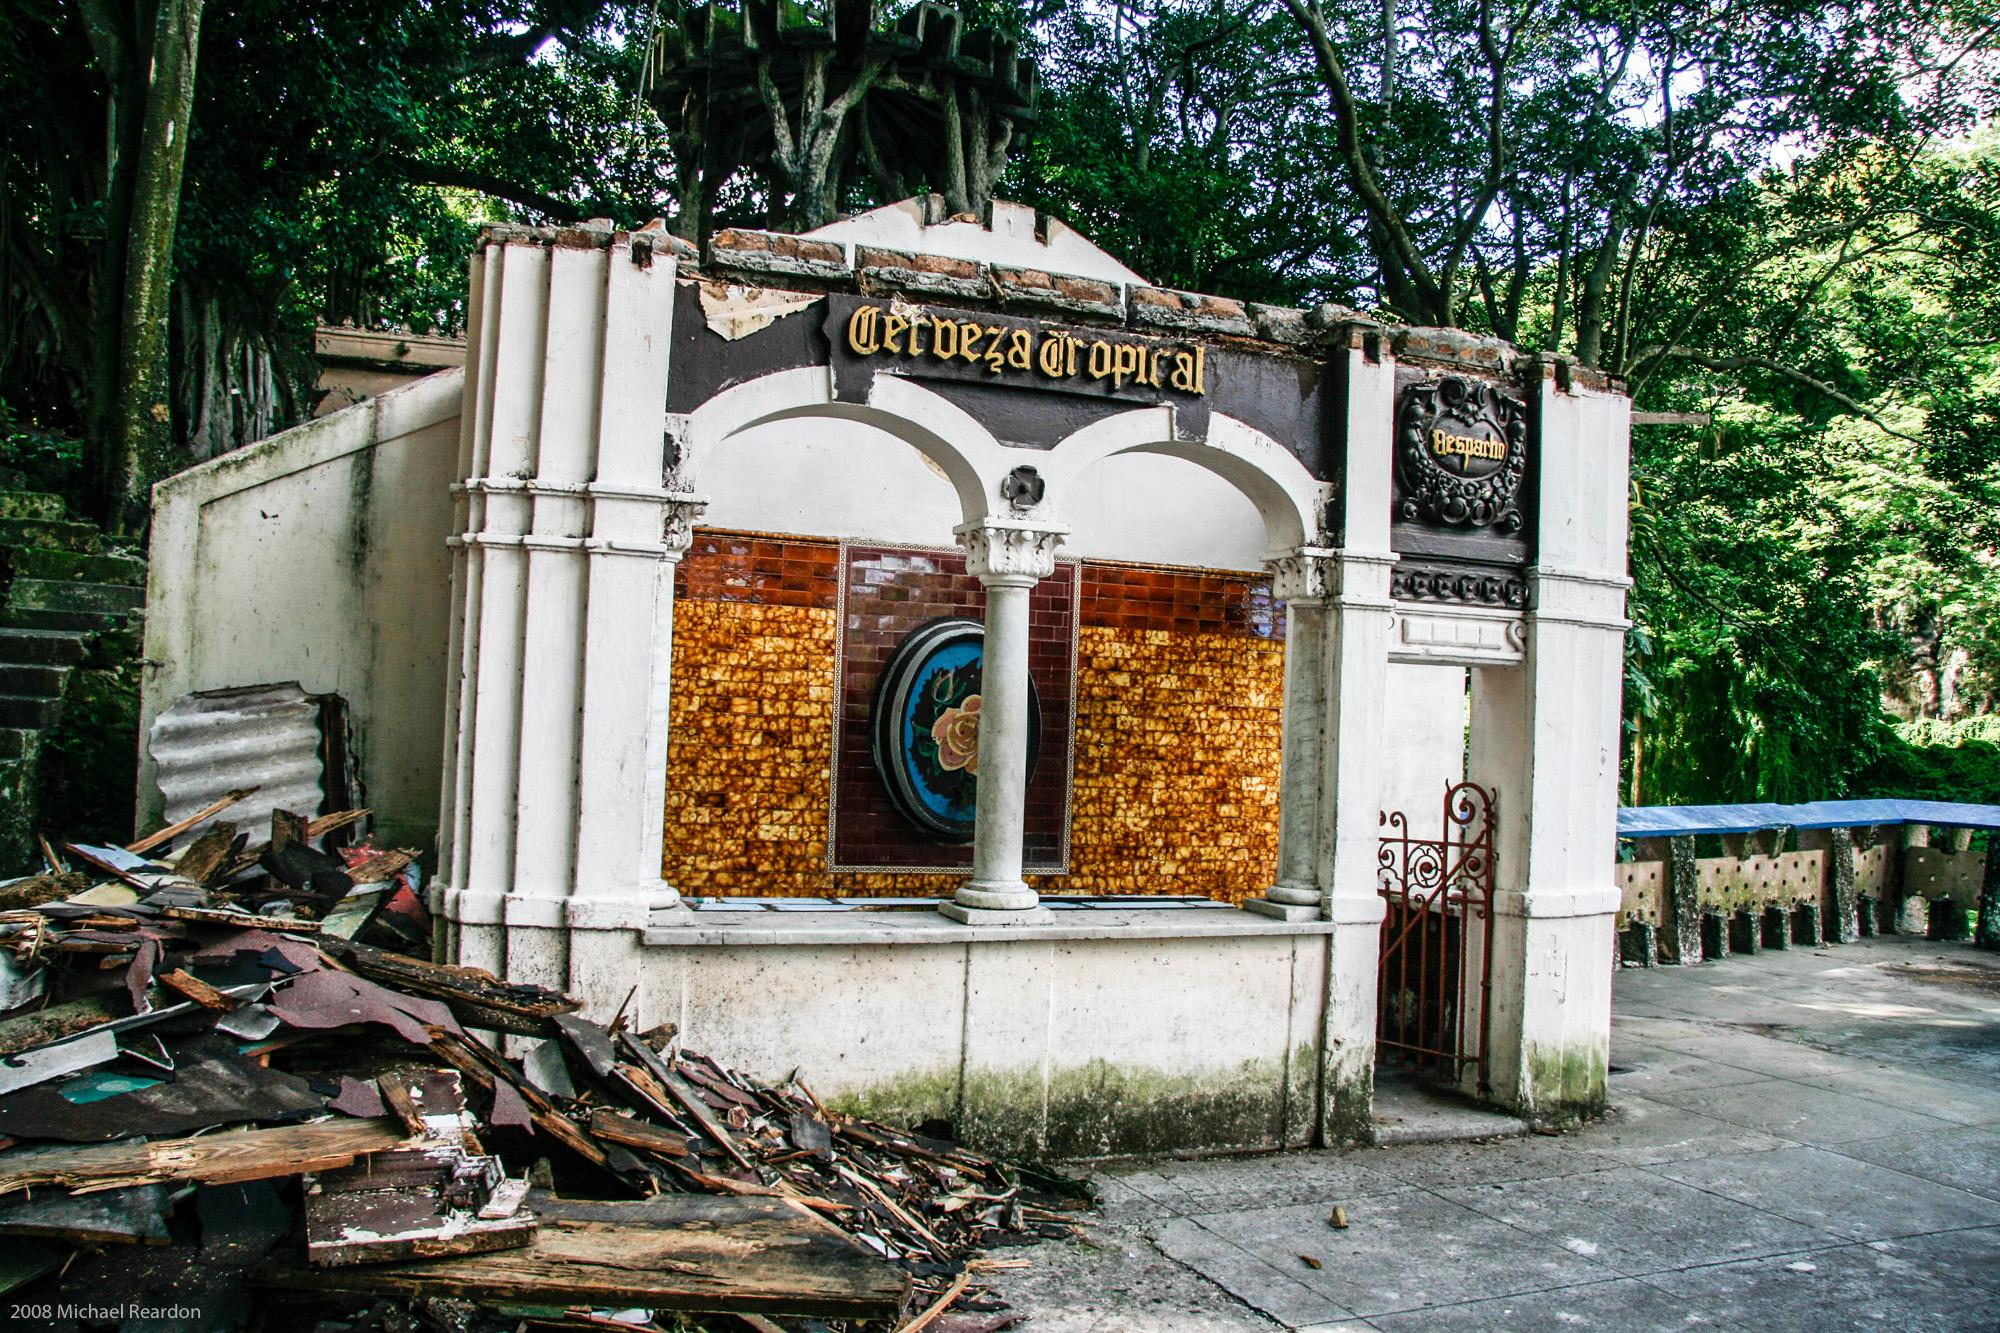 havana-jardin-tropical-5966